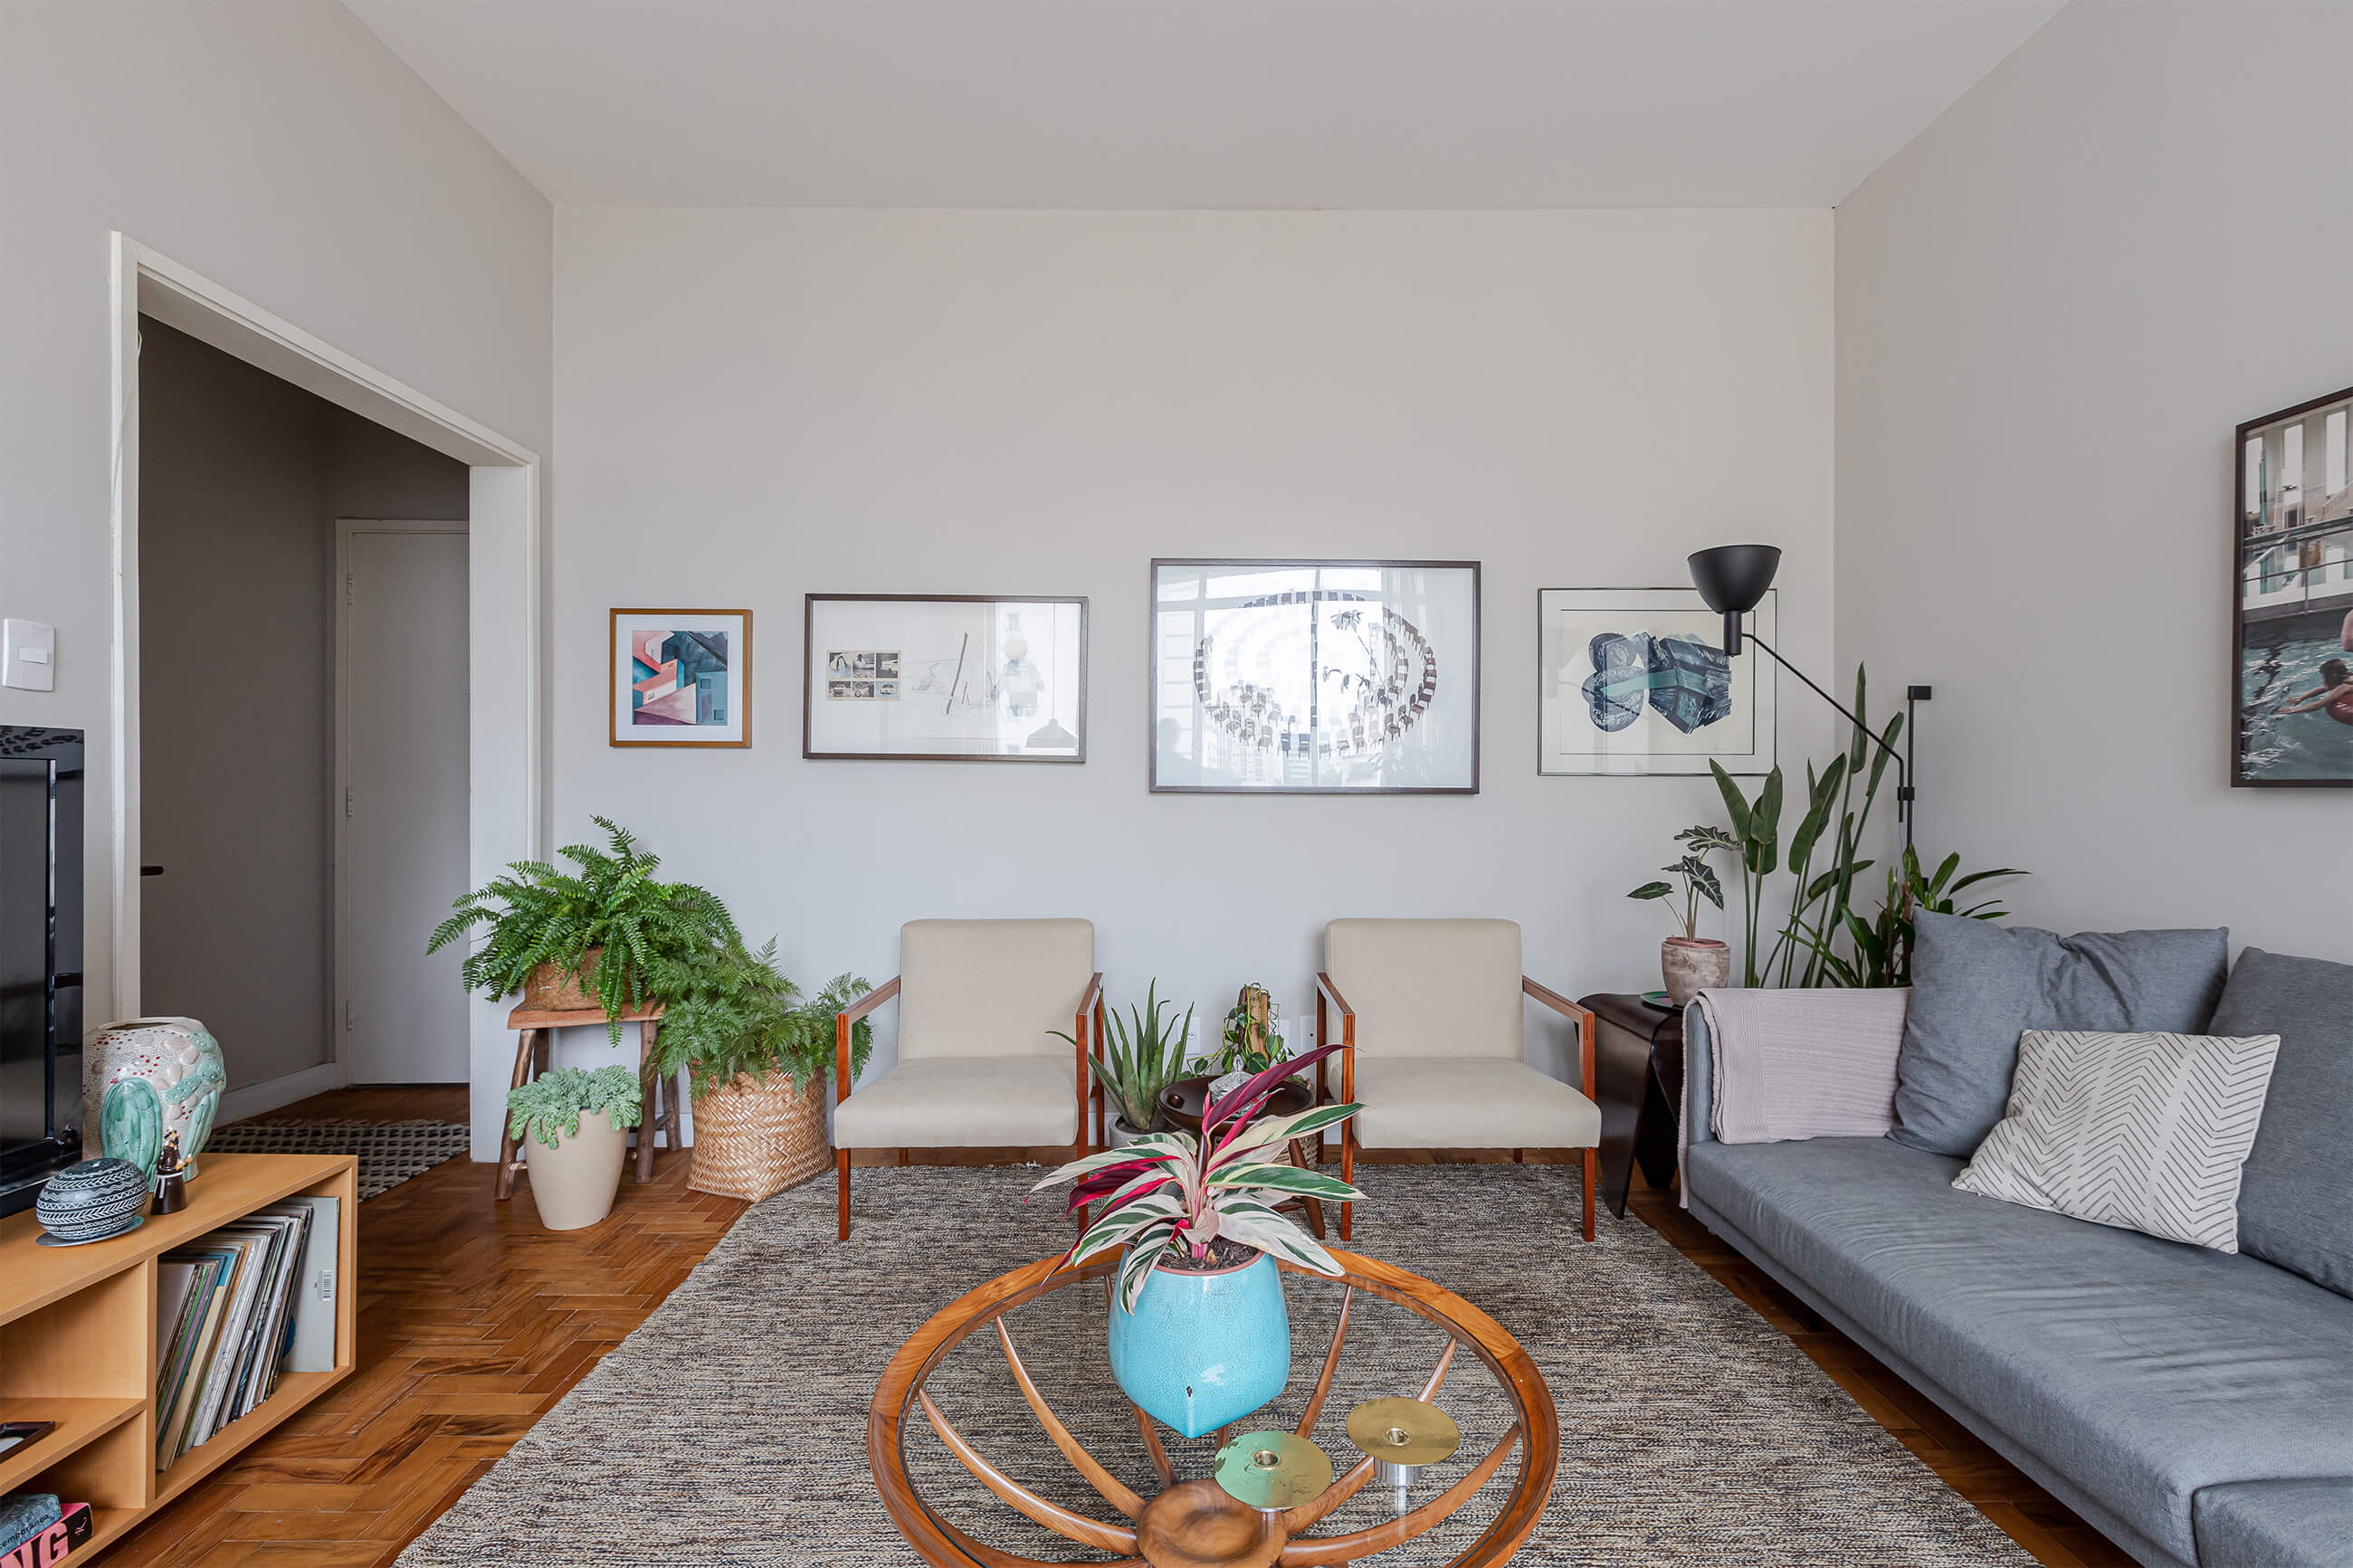 sala-tapete-sofa-cinza-mesa-madeira-vieo-vaso-azul